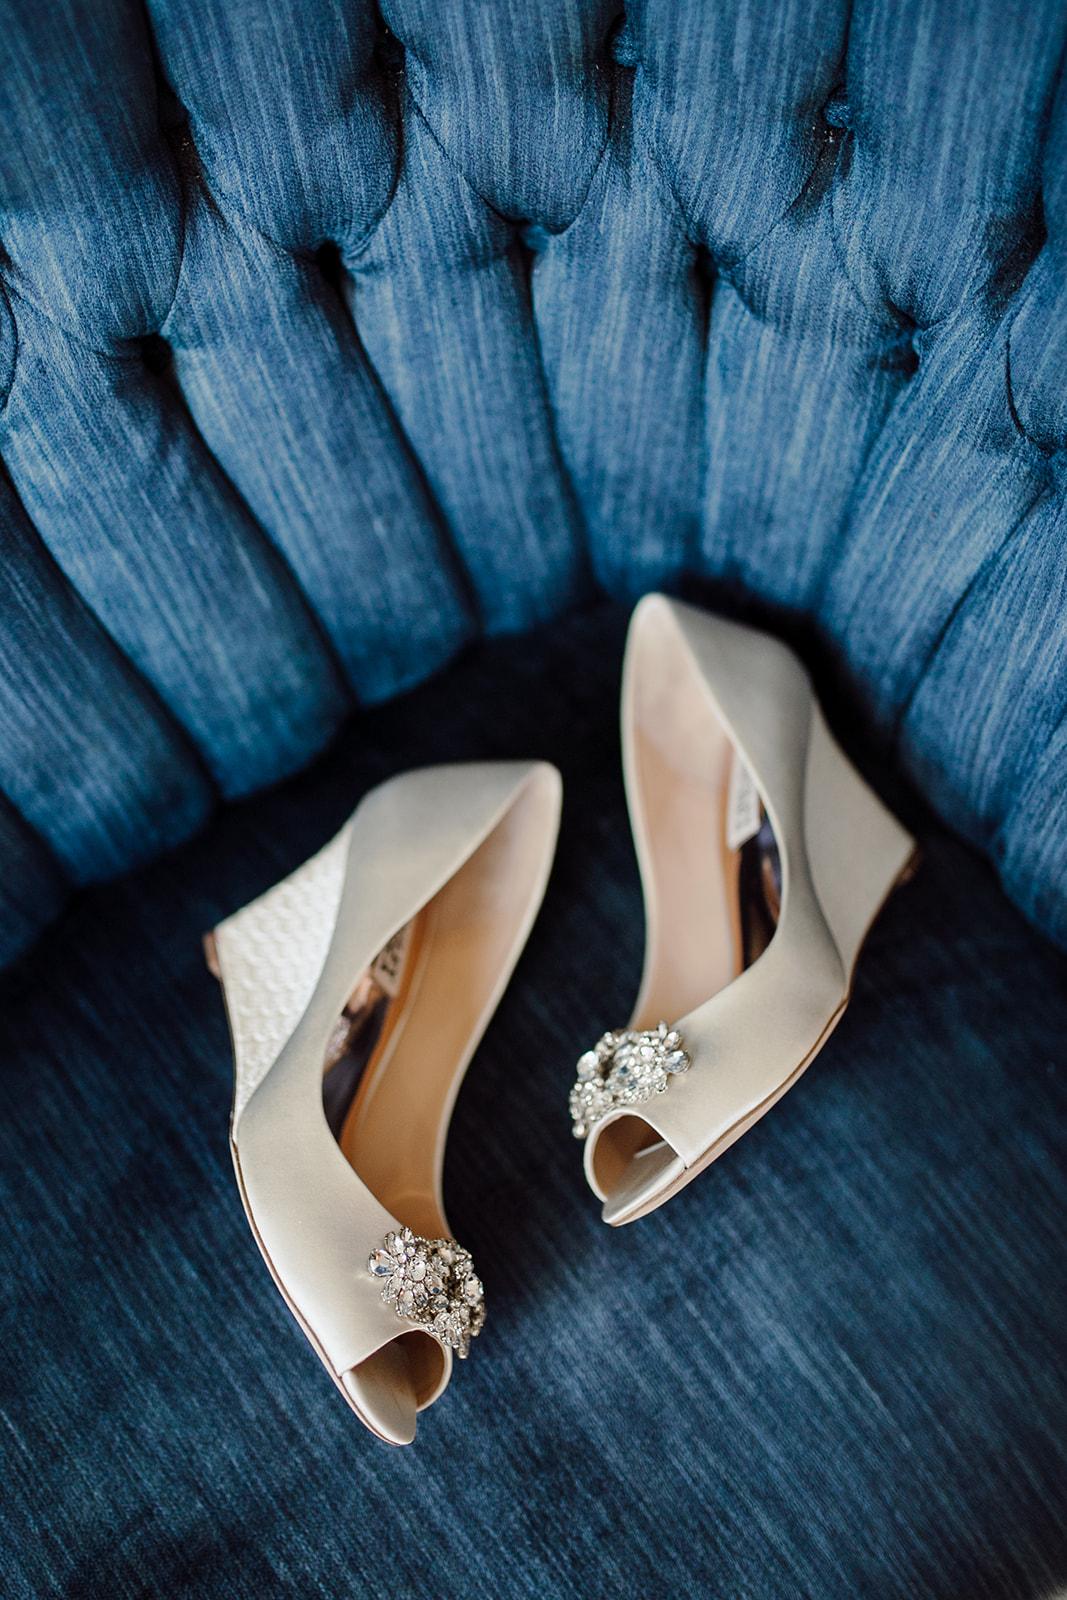 Peep toe bridal shoe wedges